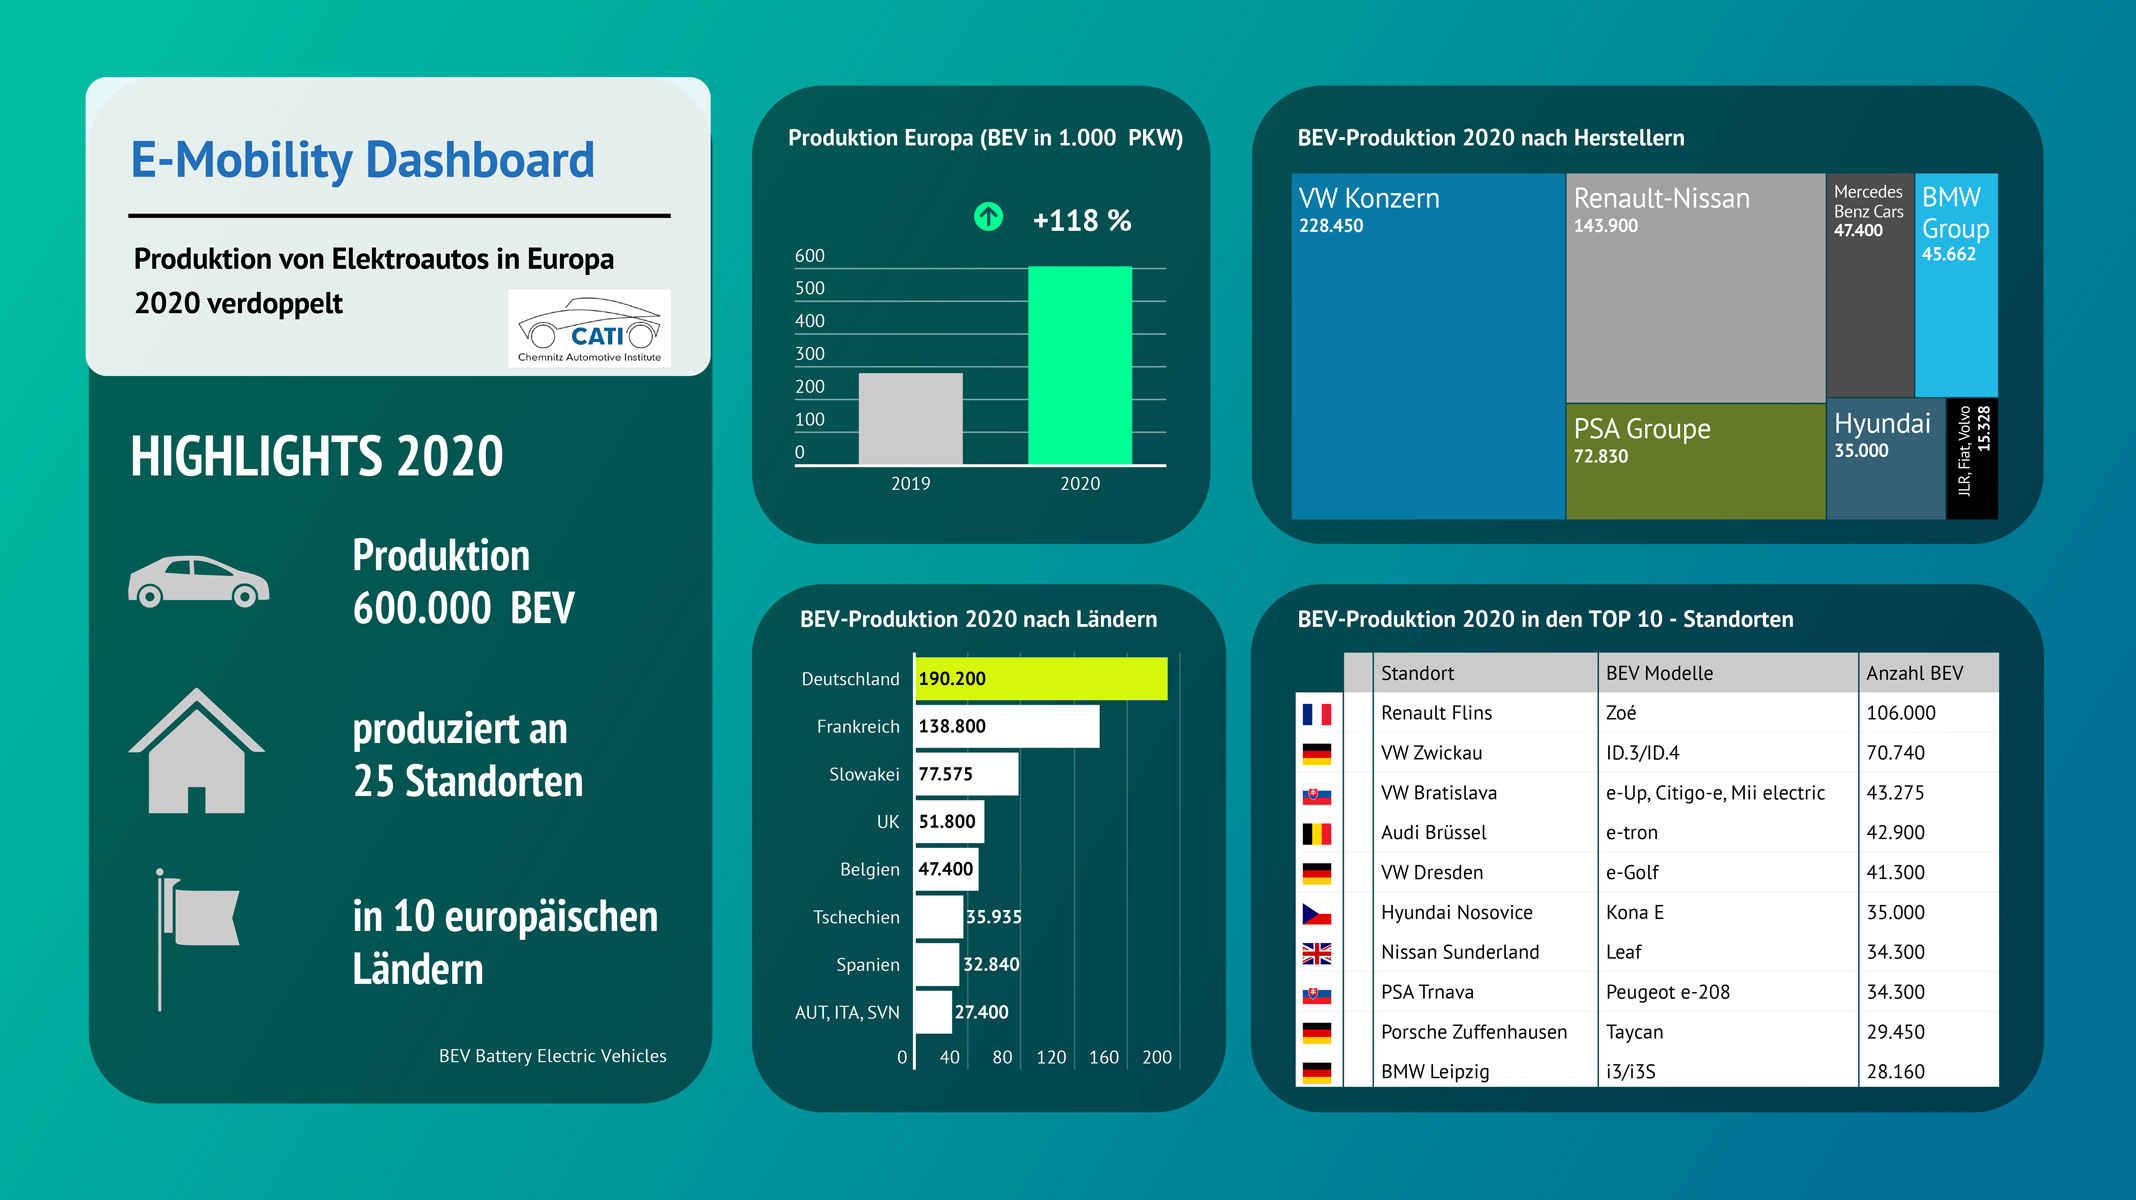 e-mobility-dashboard-2020-europa